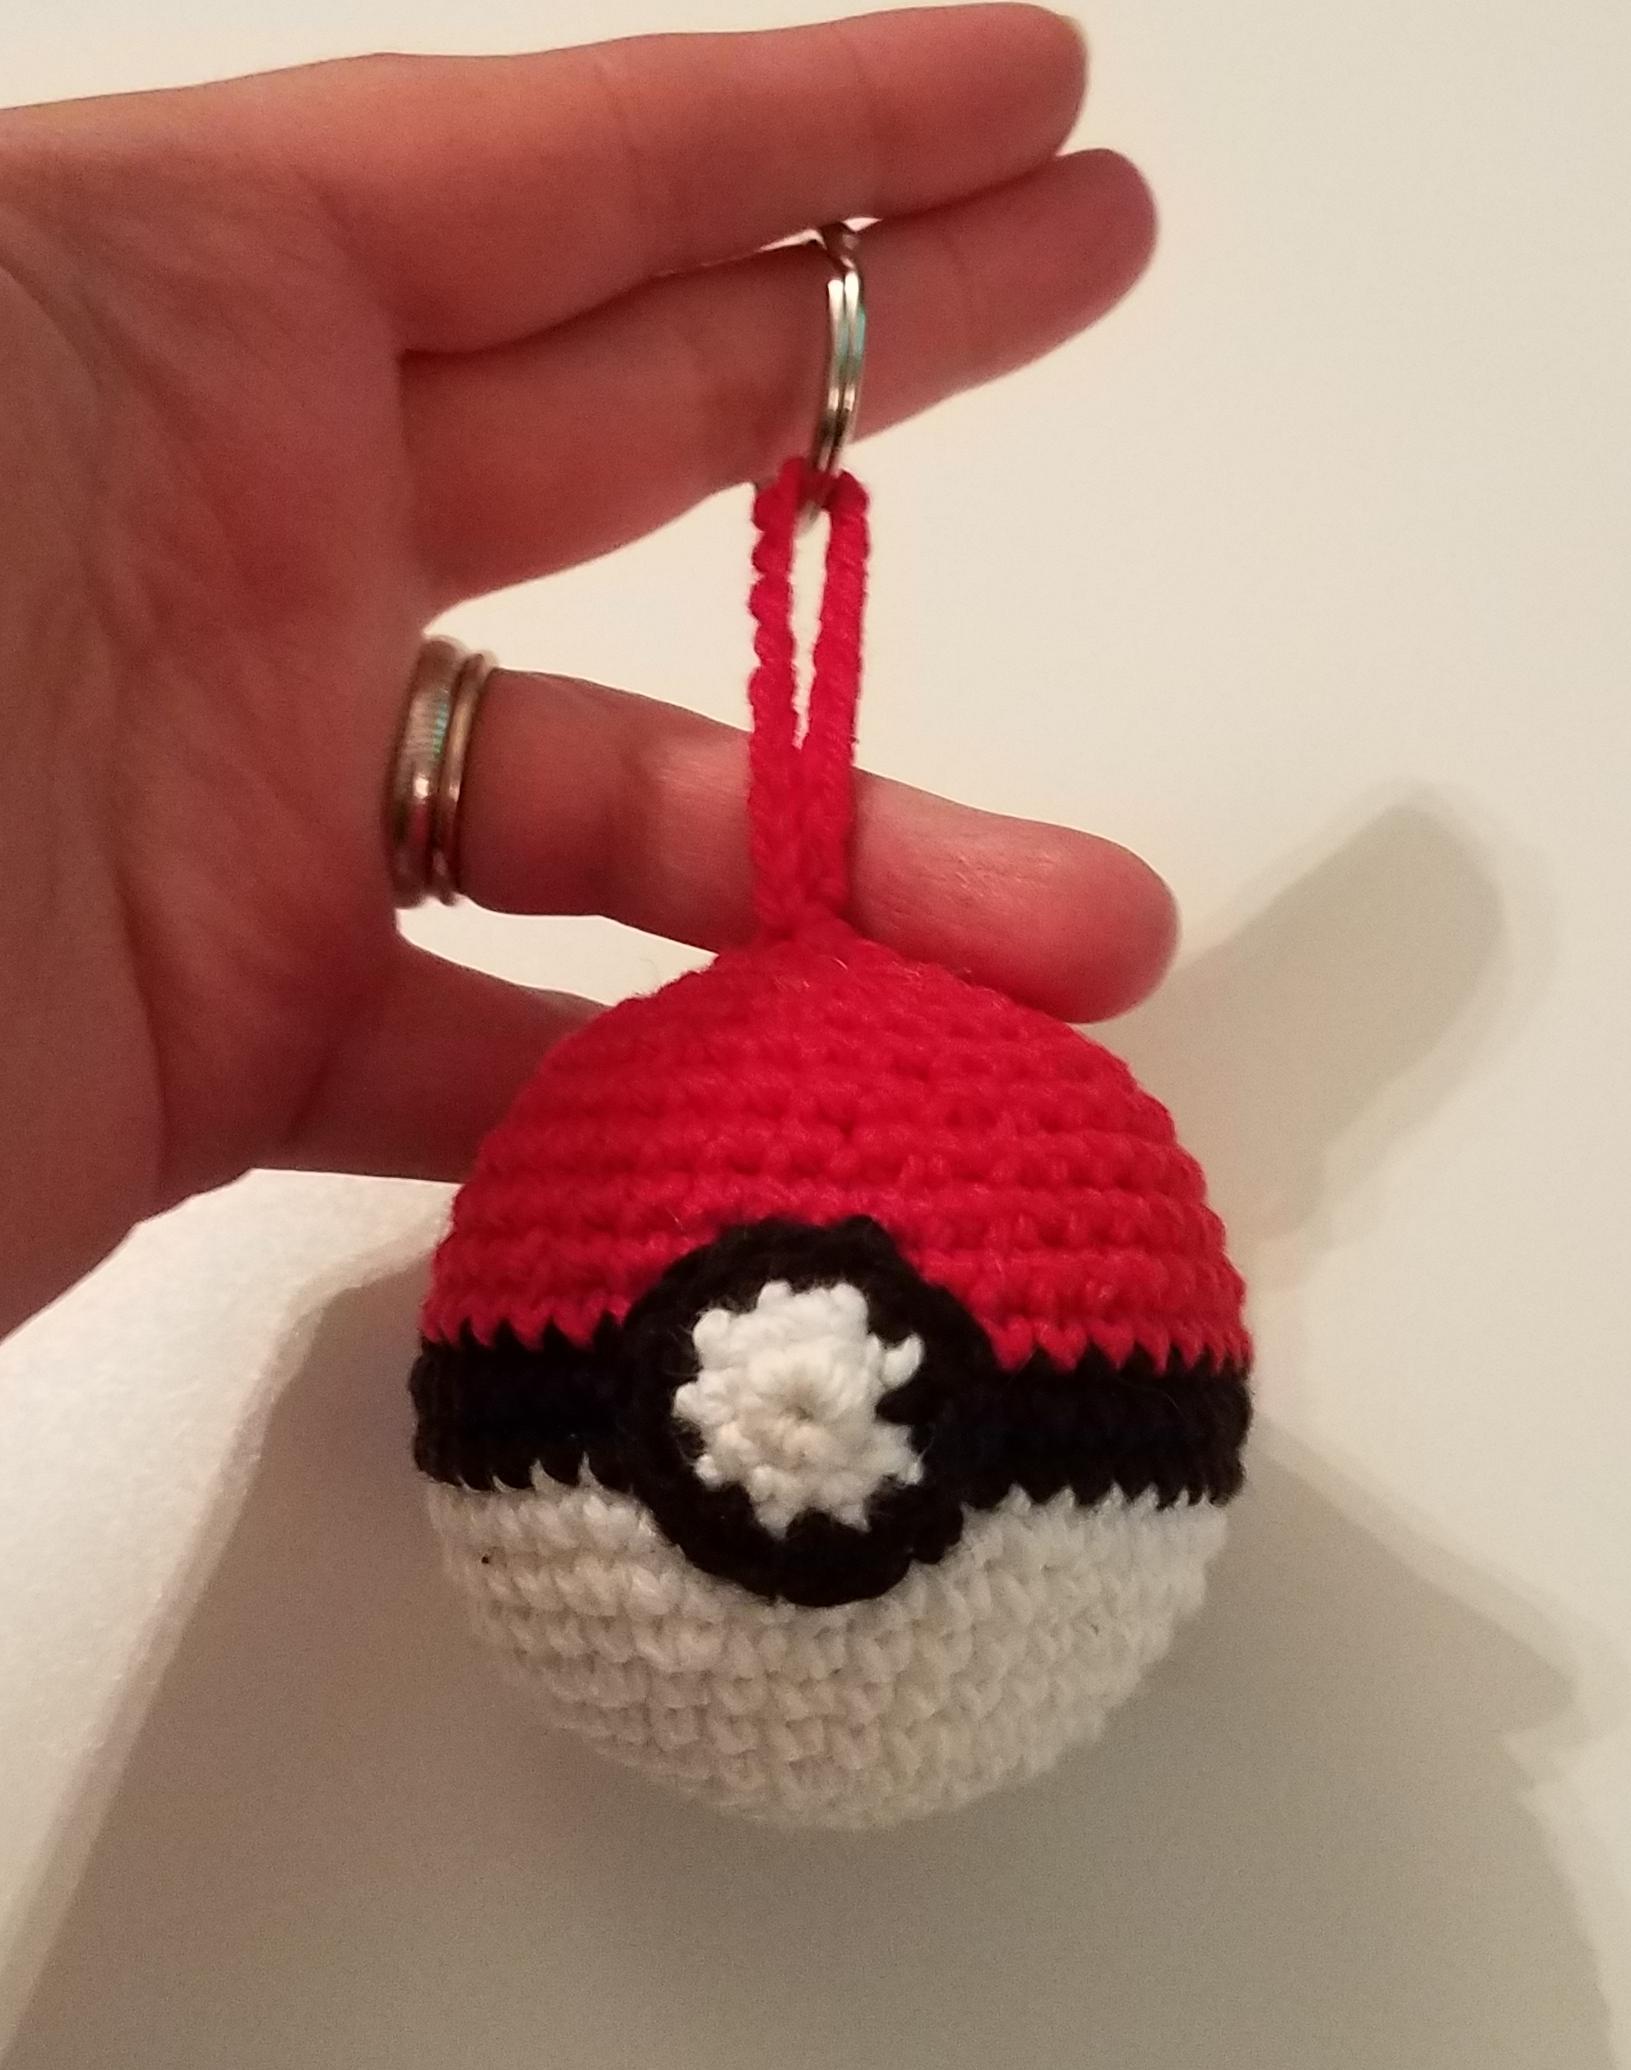 How to Crochet - Magic Ring (or Magic Circle) - YouTube | 2070x1631